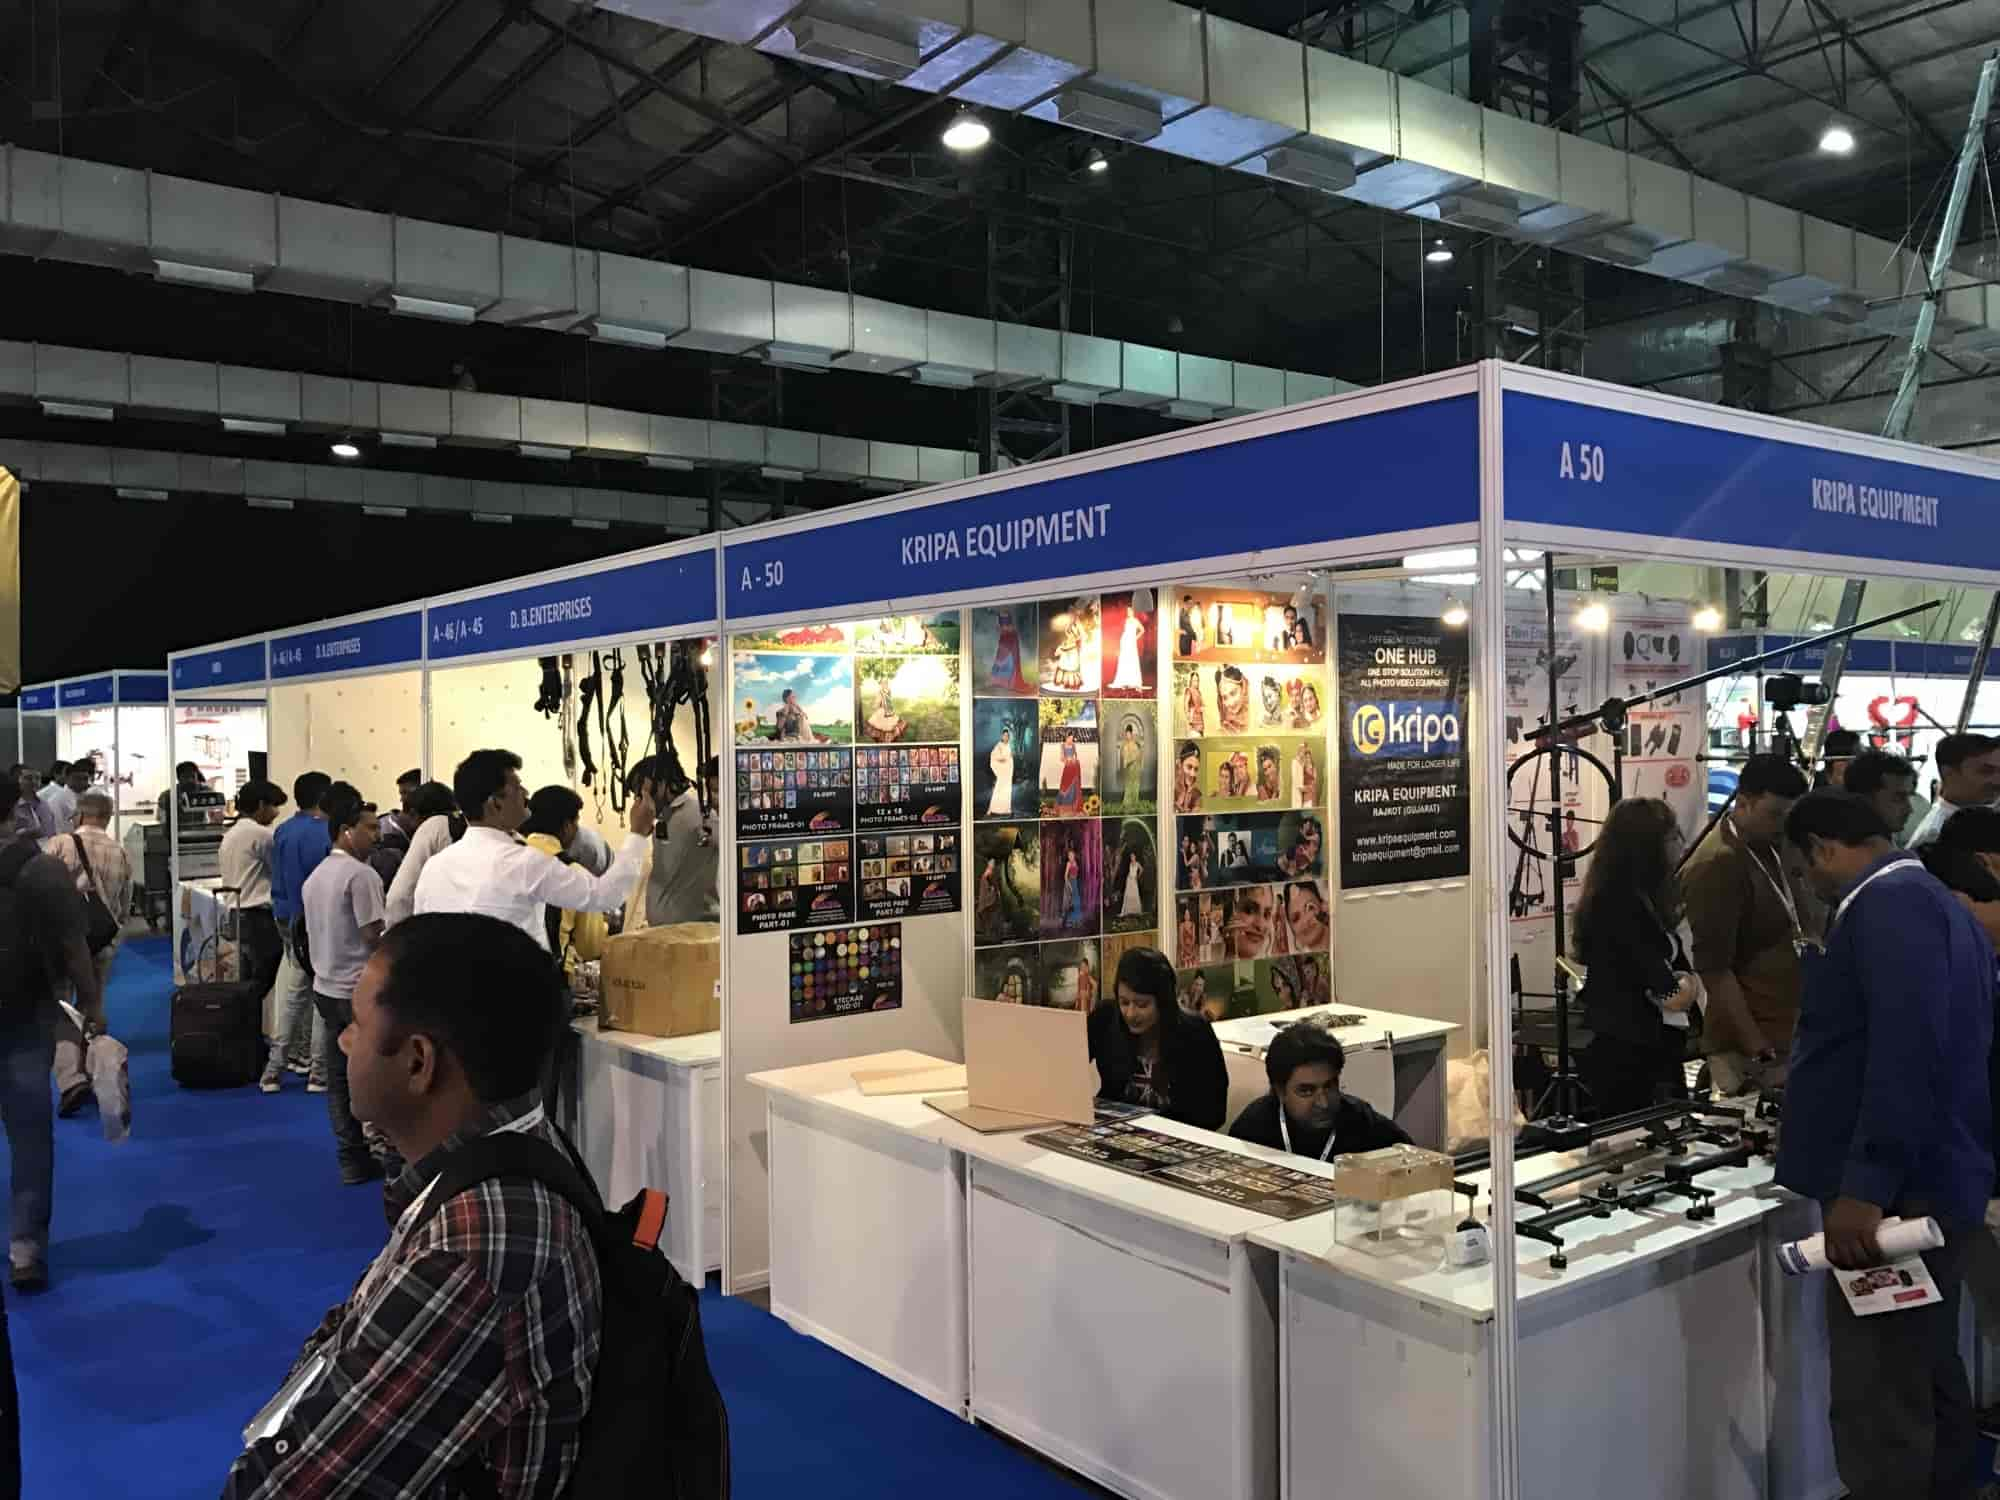 Exhibition Stall In Pune : Creative expo systems photos shivaji nagar model colony pune